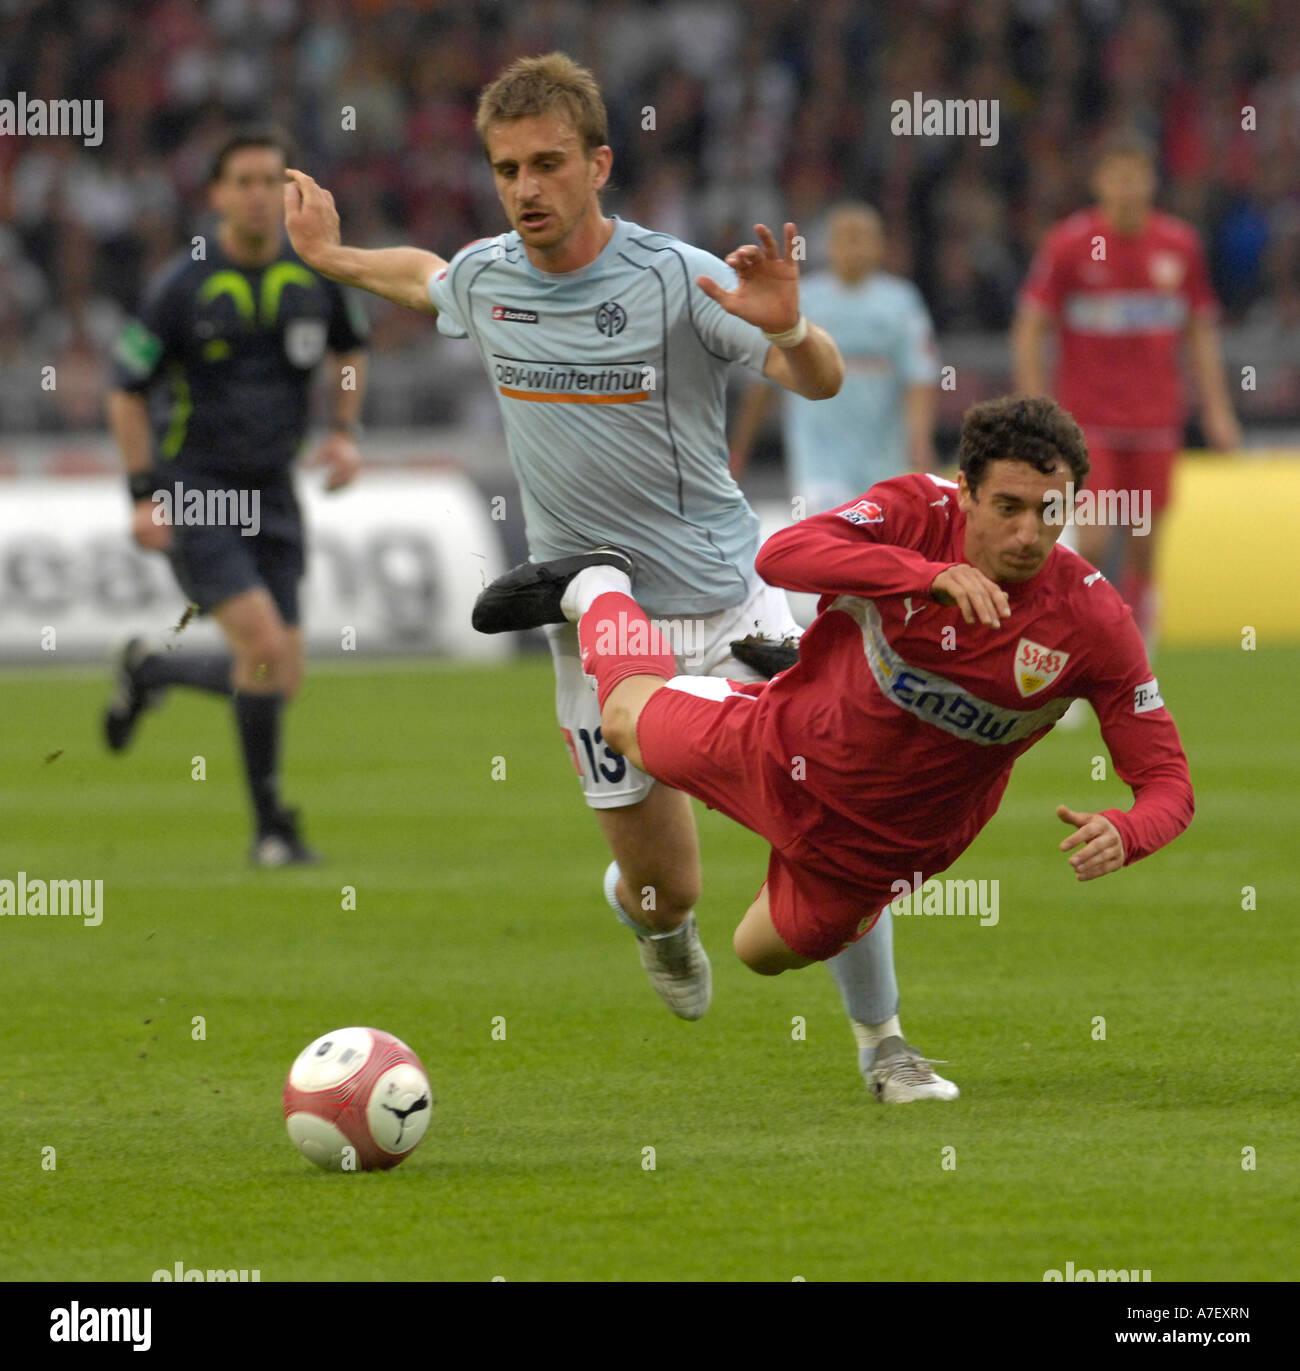 Milorad PEKOVIC FSV Mainz 05 (left) fouls Roberto HILBERT VfB Stuttgart - Stock Image